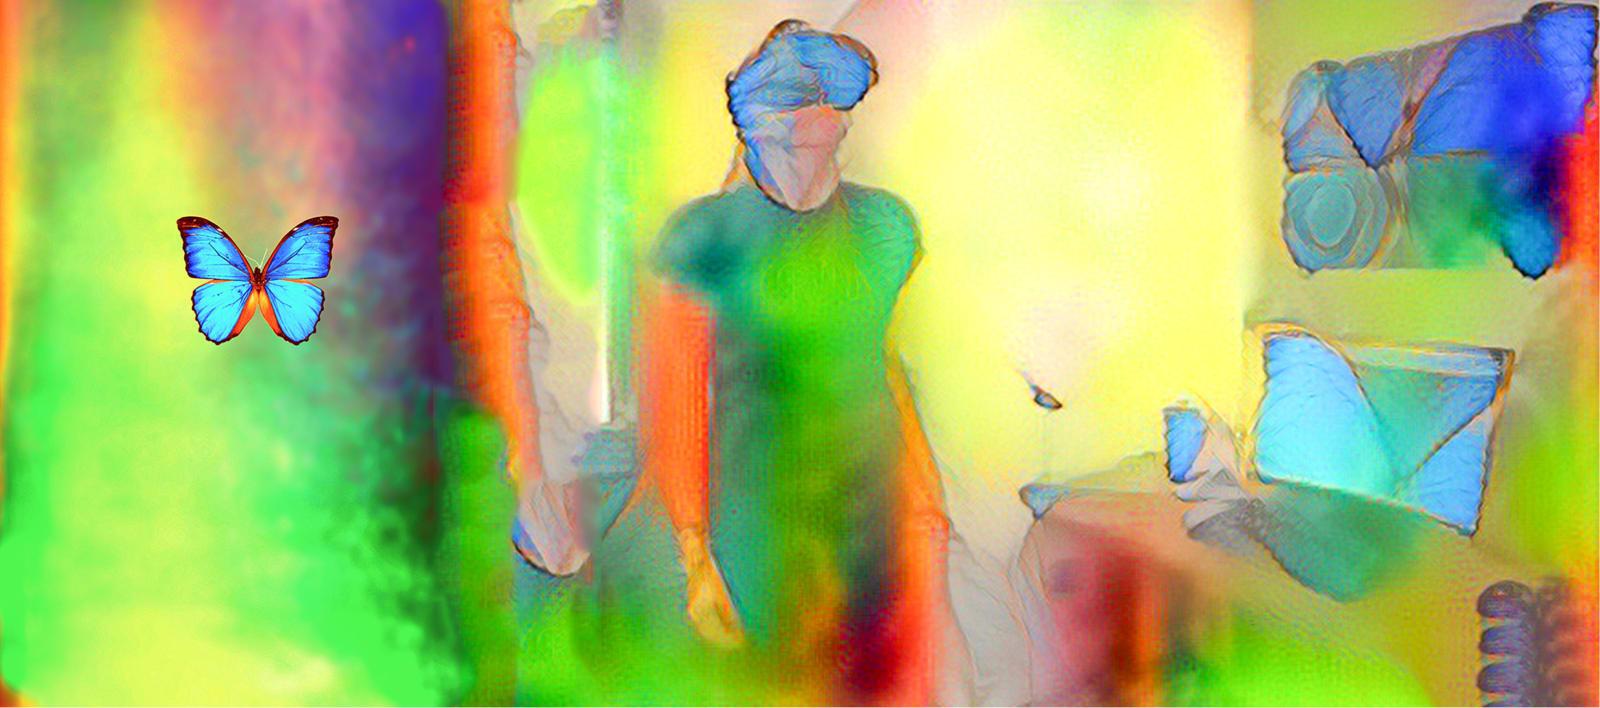 Pamela Davis Kivelson, #59 Opal VR Lab, 2019